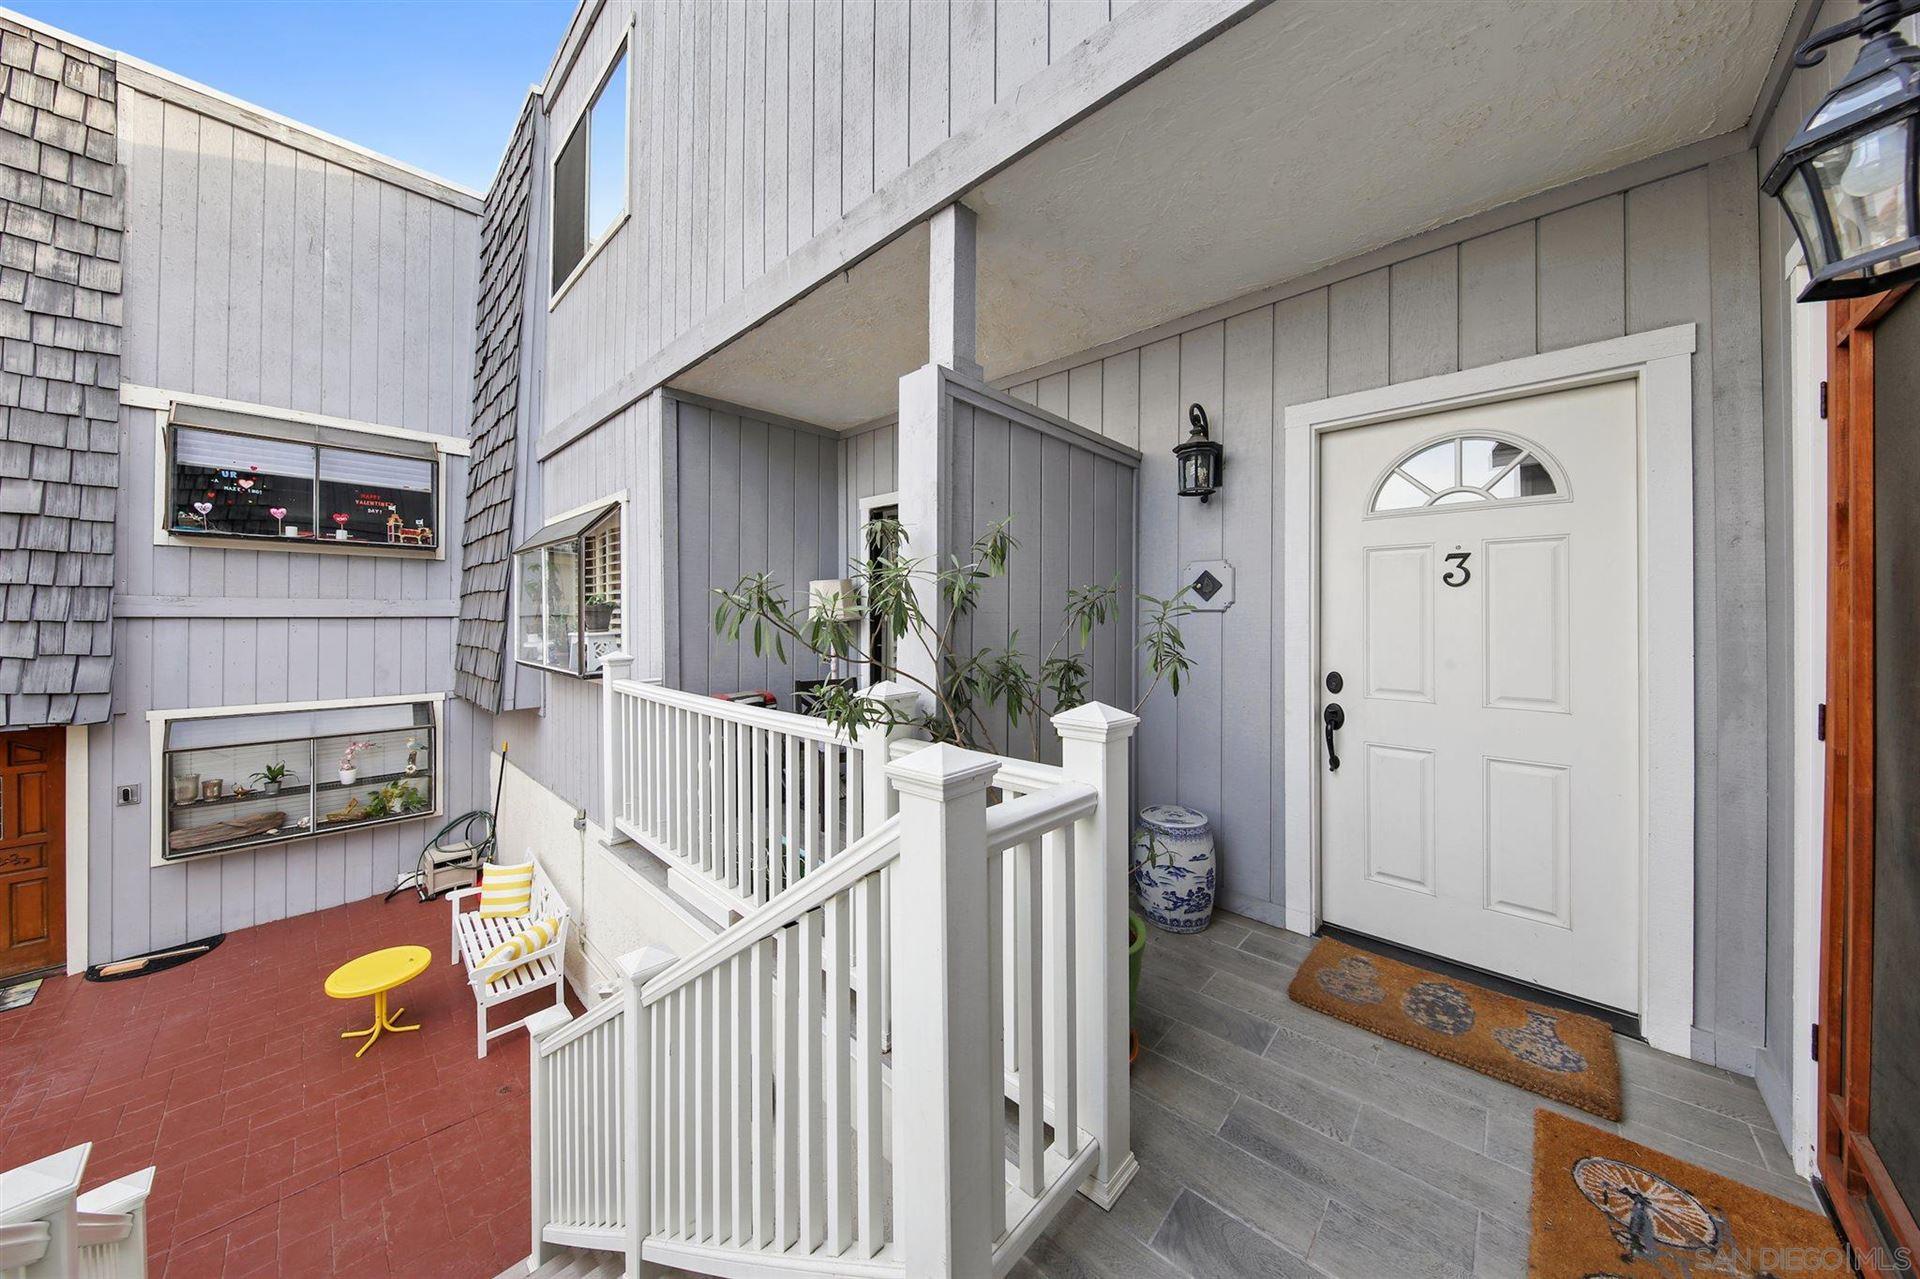 Photo of 333 D Avenue #3, Coronado, CA 92118 (MLS # 210001143)